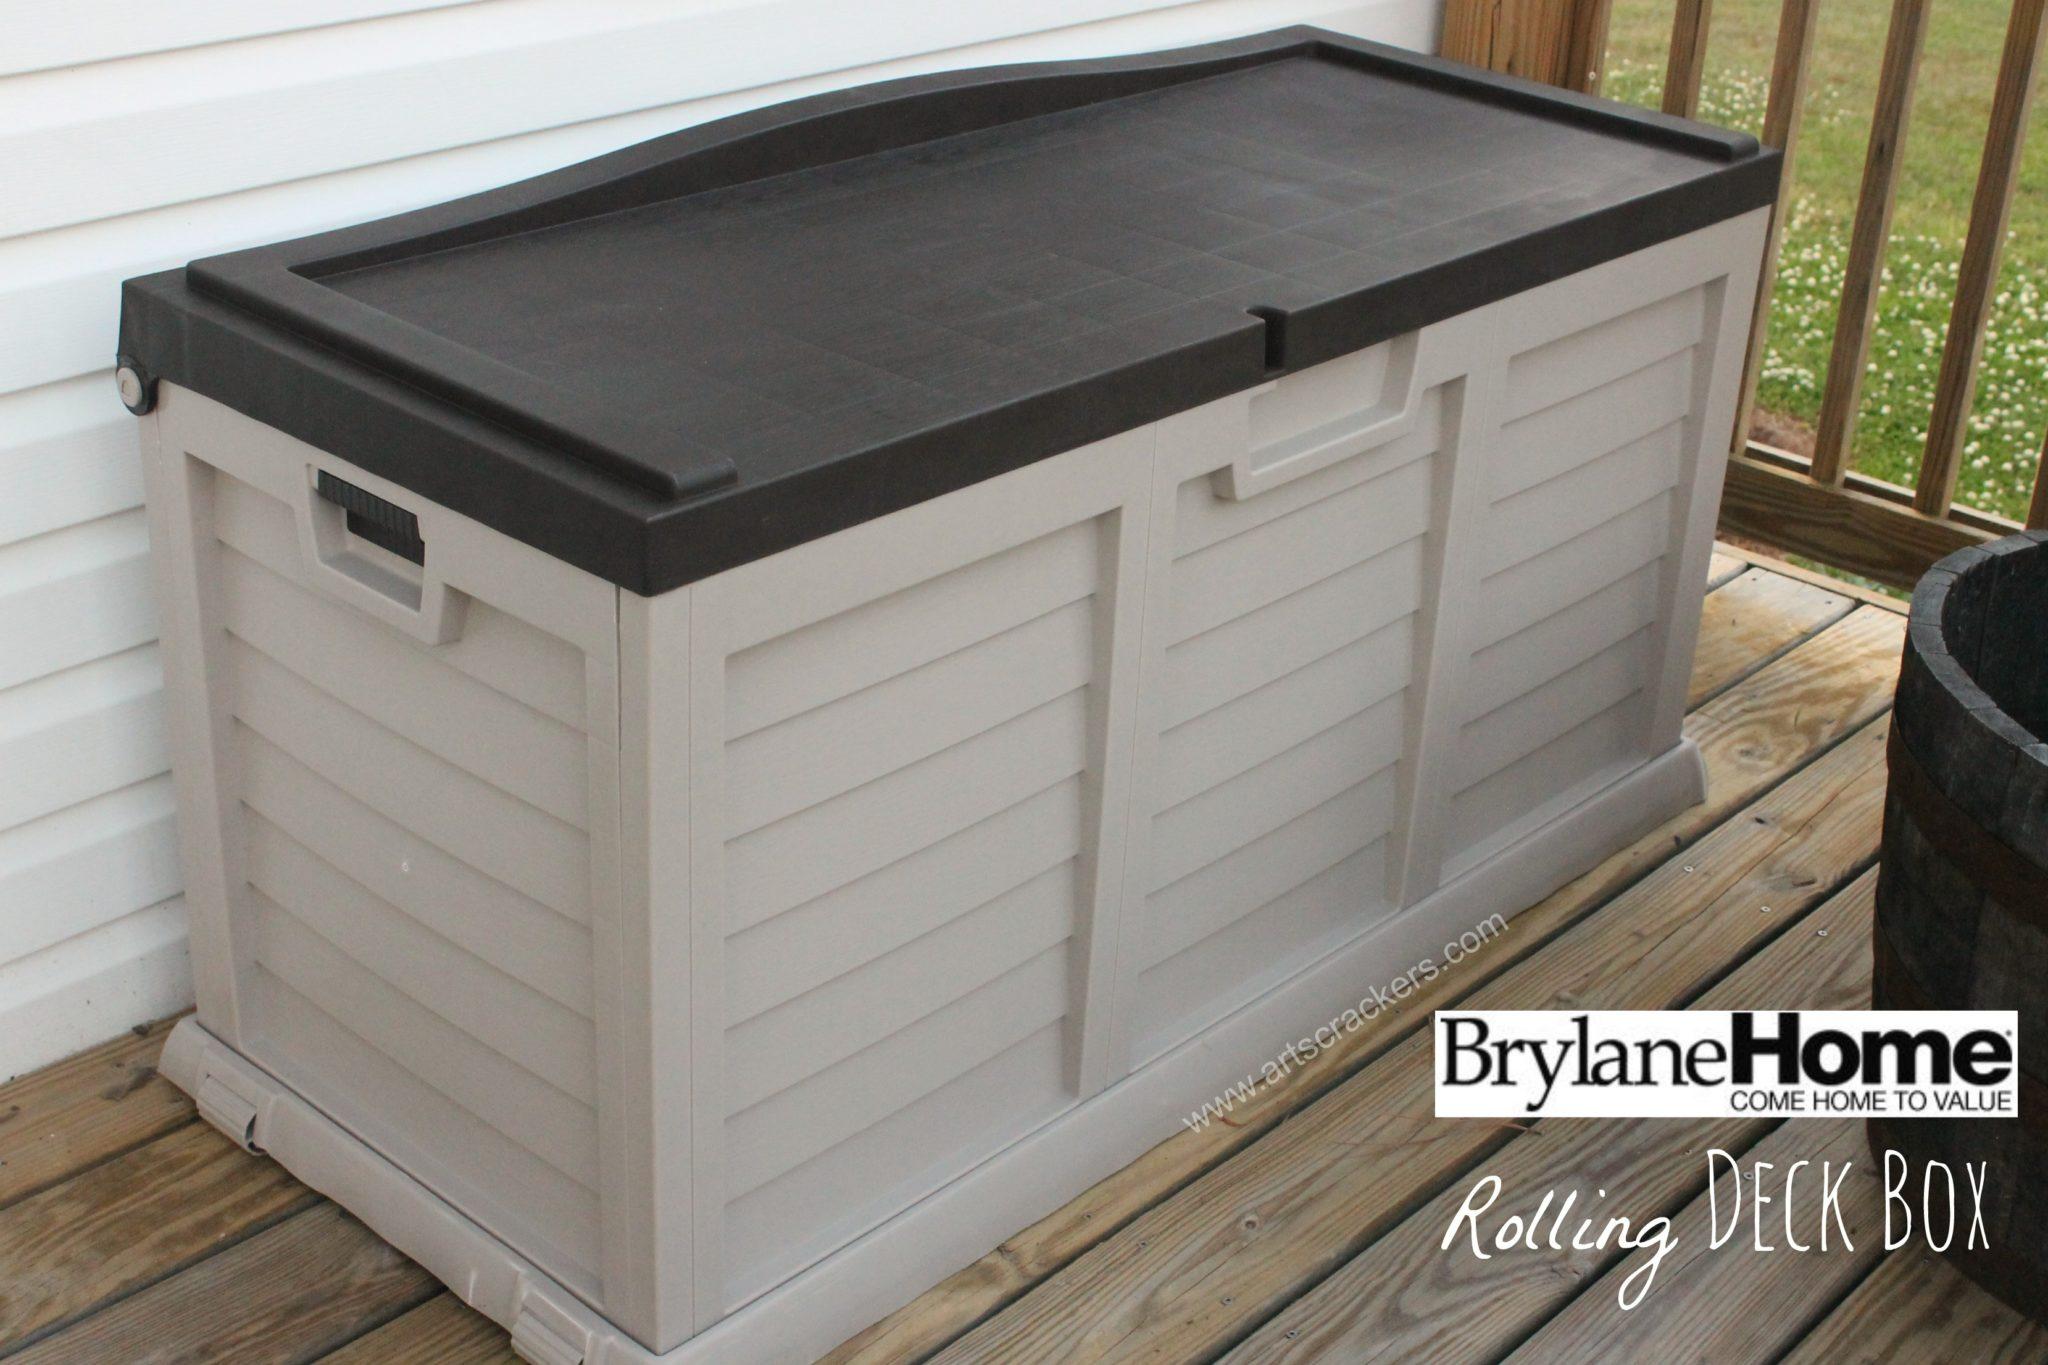 brylanehome rolling deck box